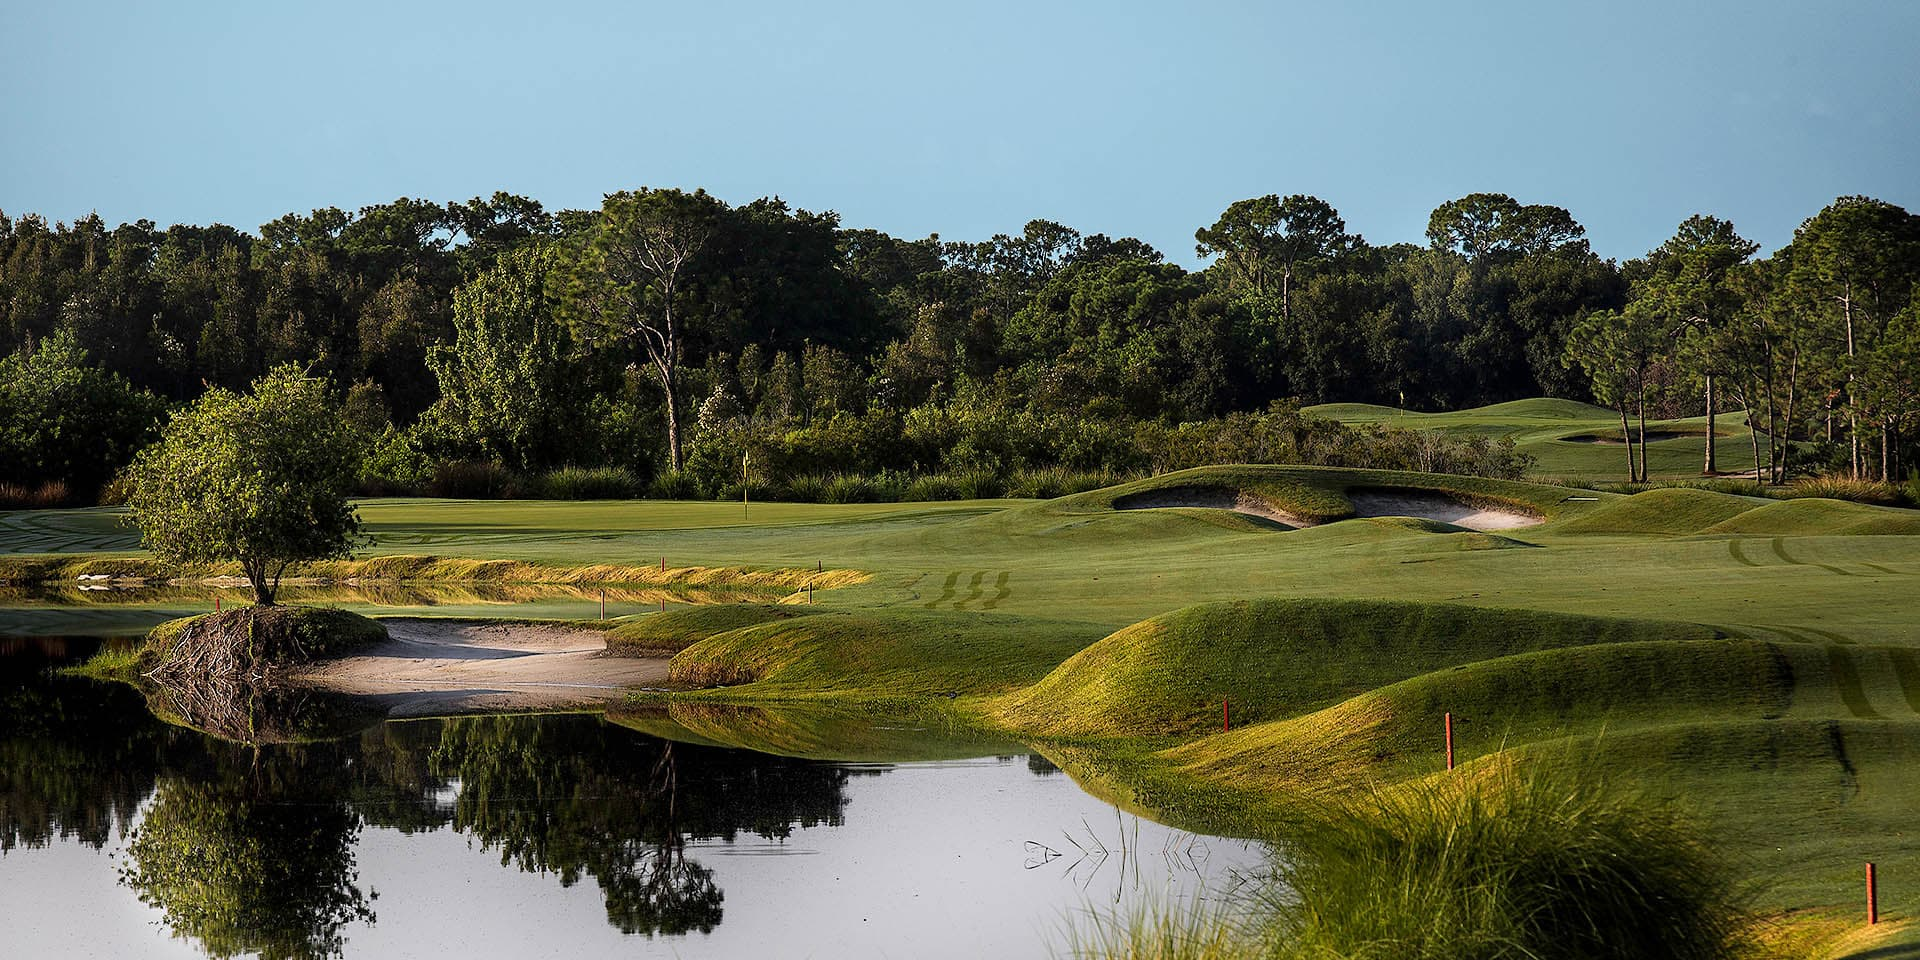 Spela golf på en golfresa